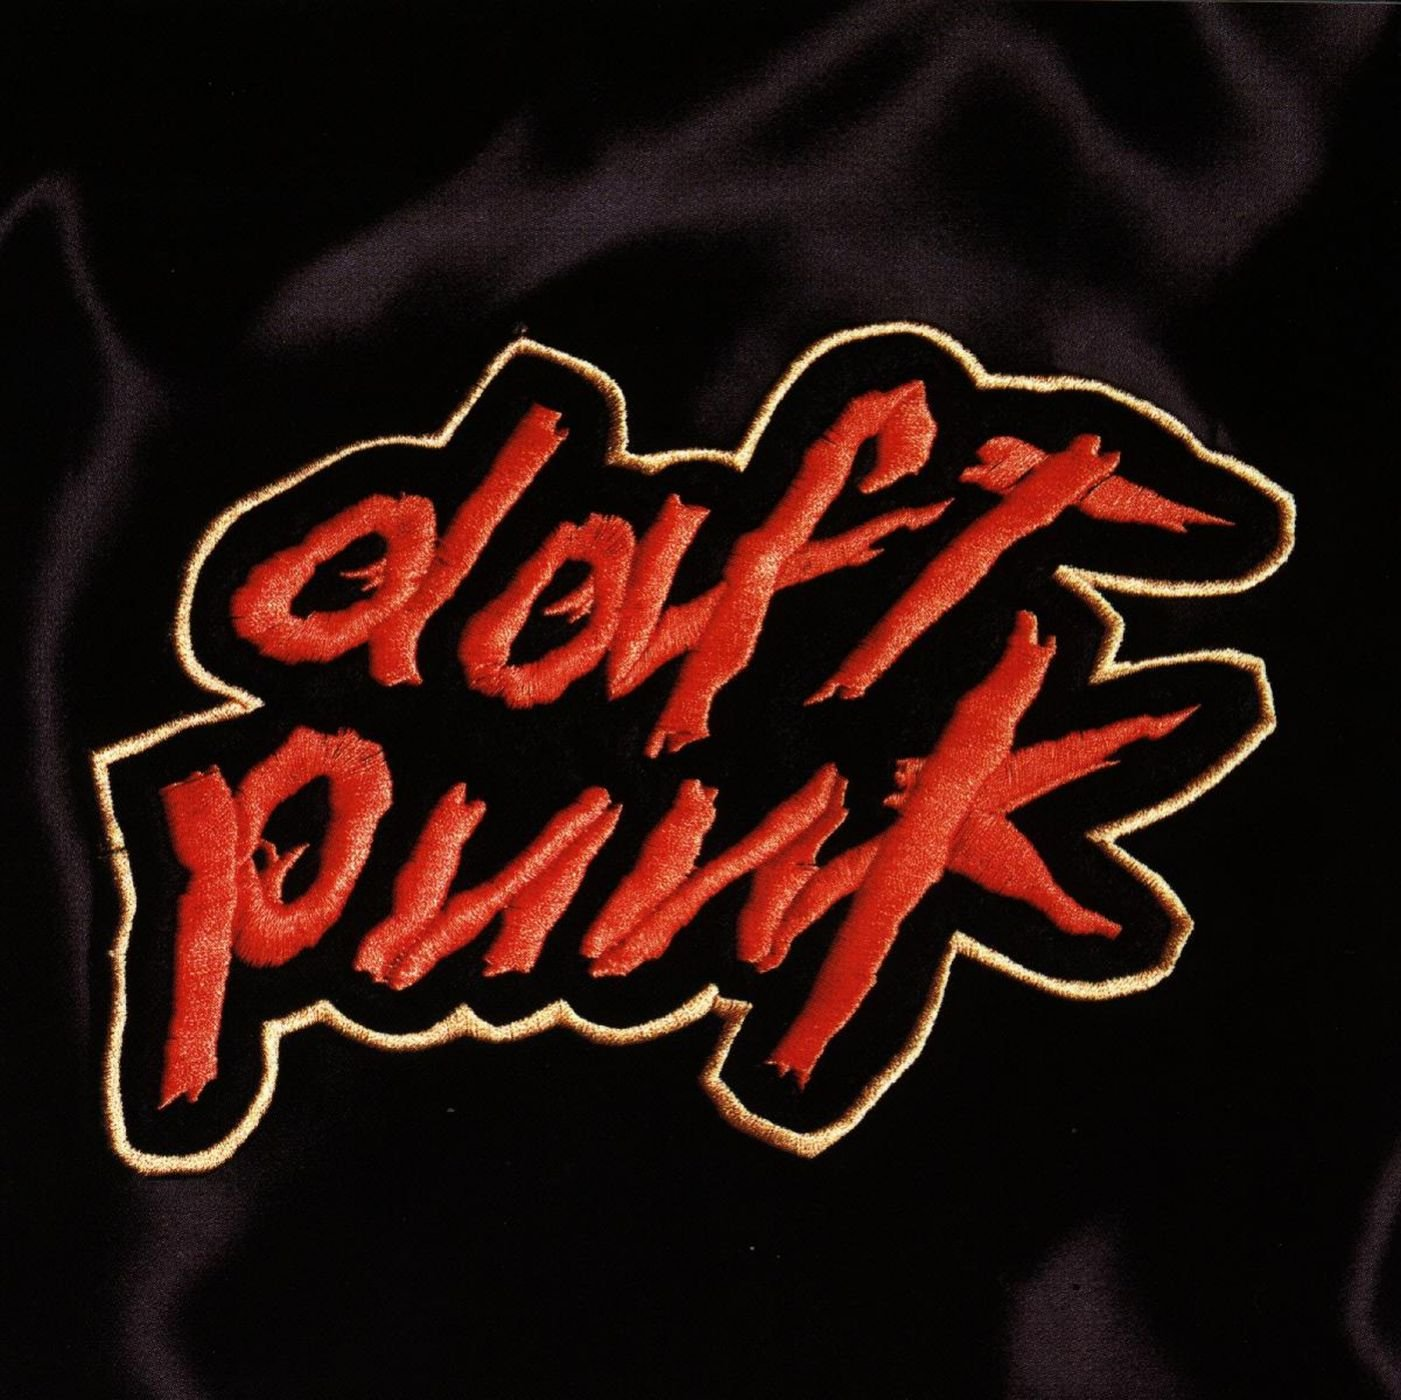 Daft Punk, Homework